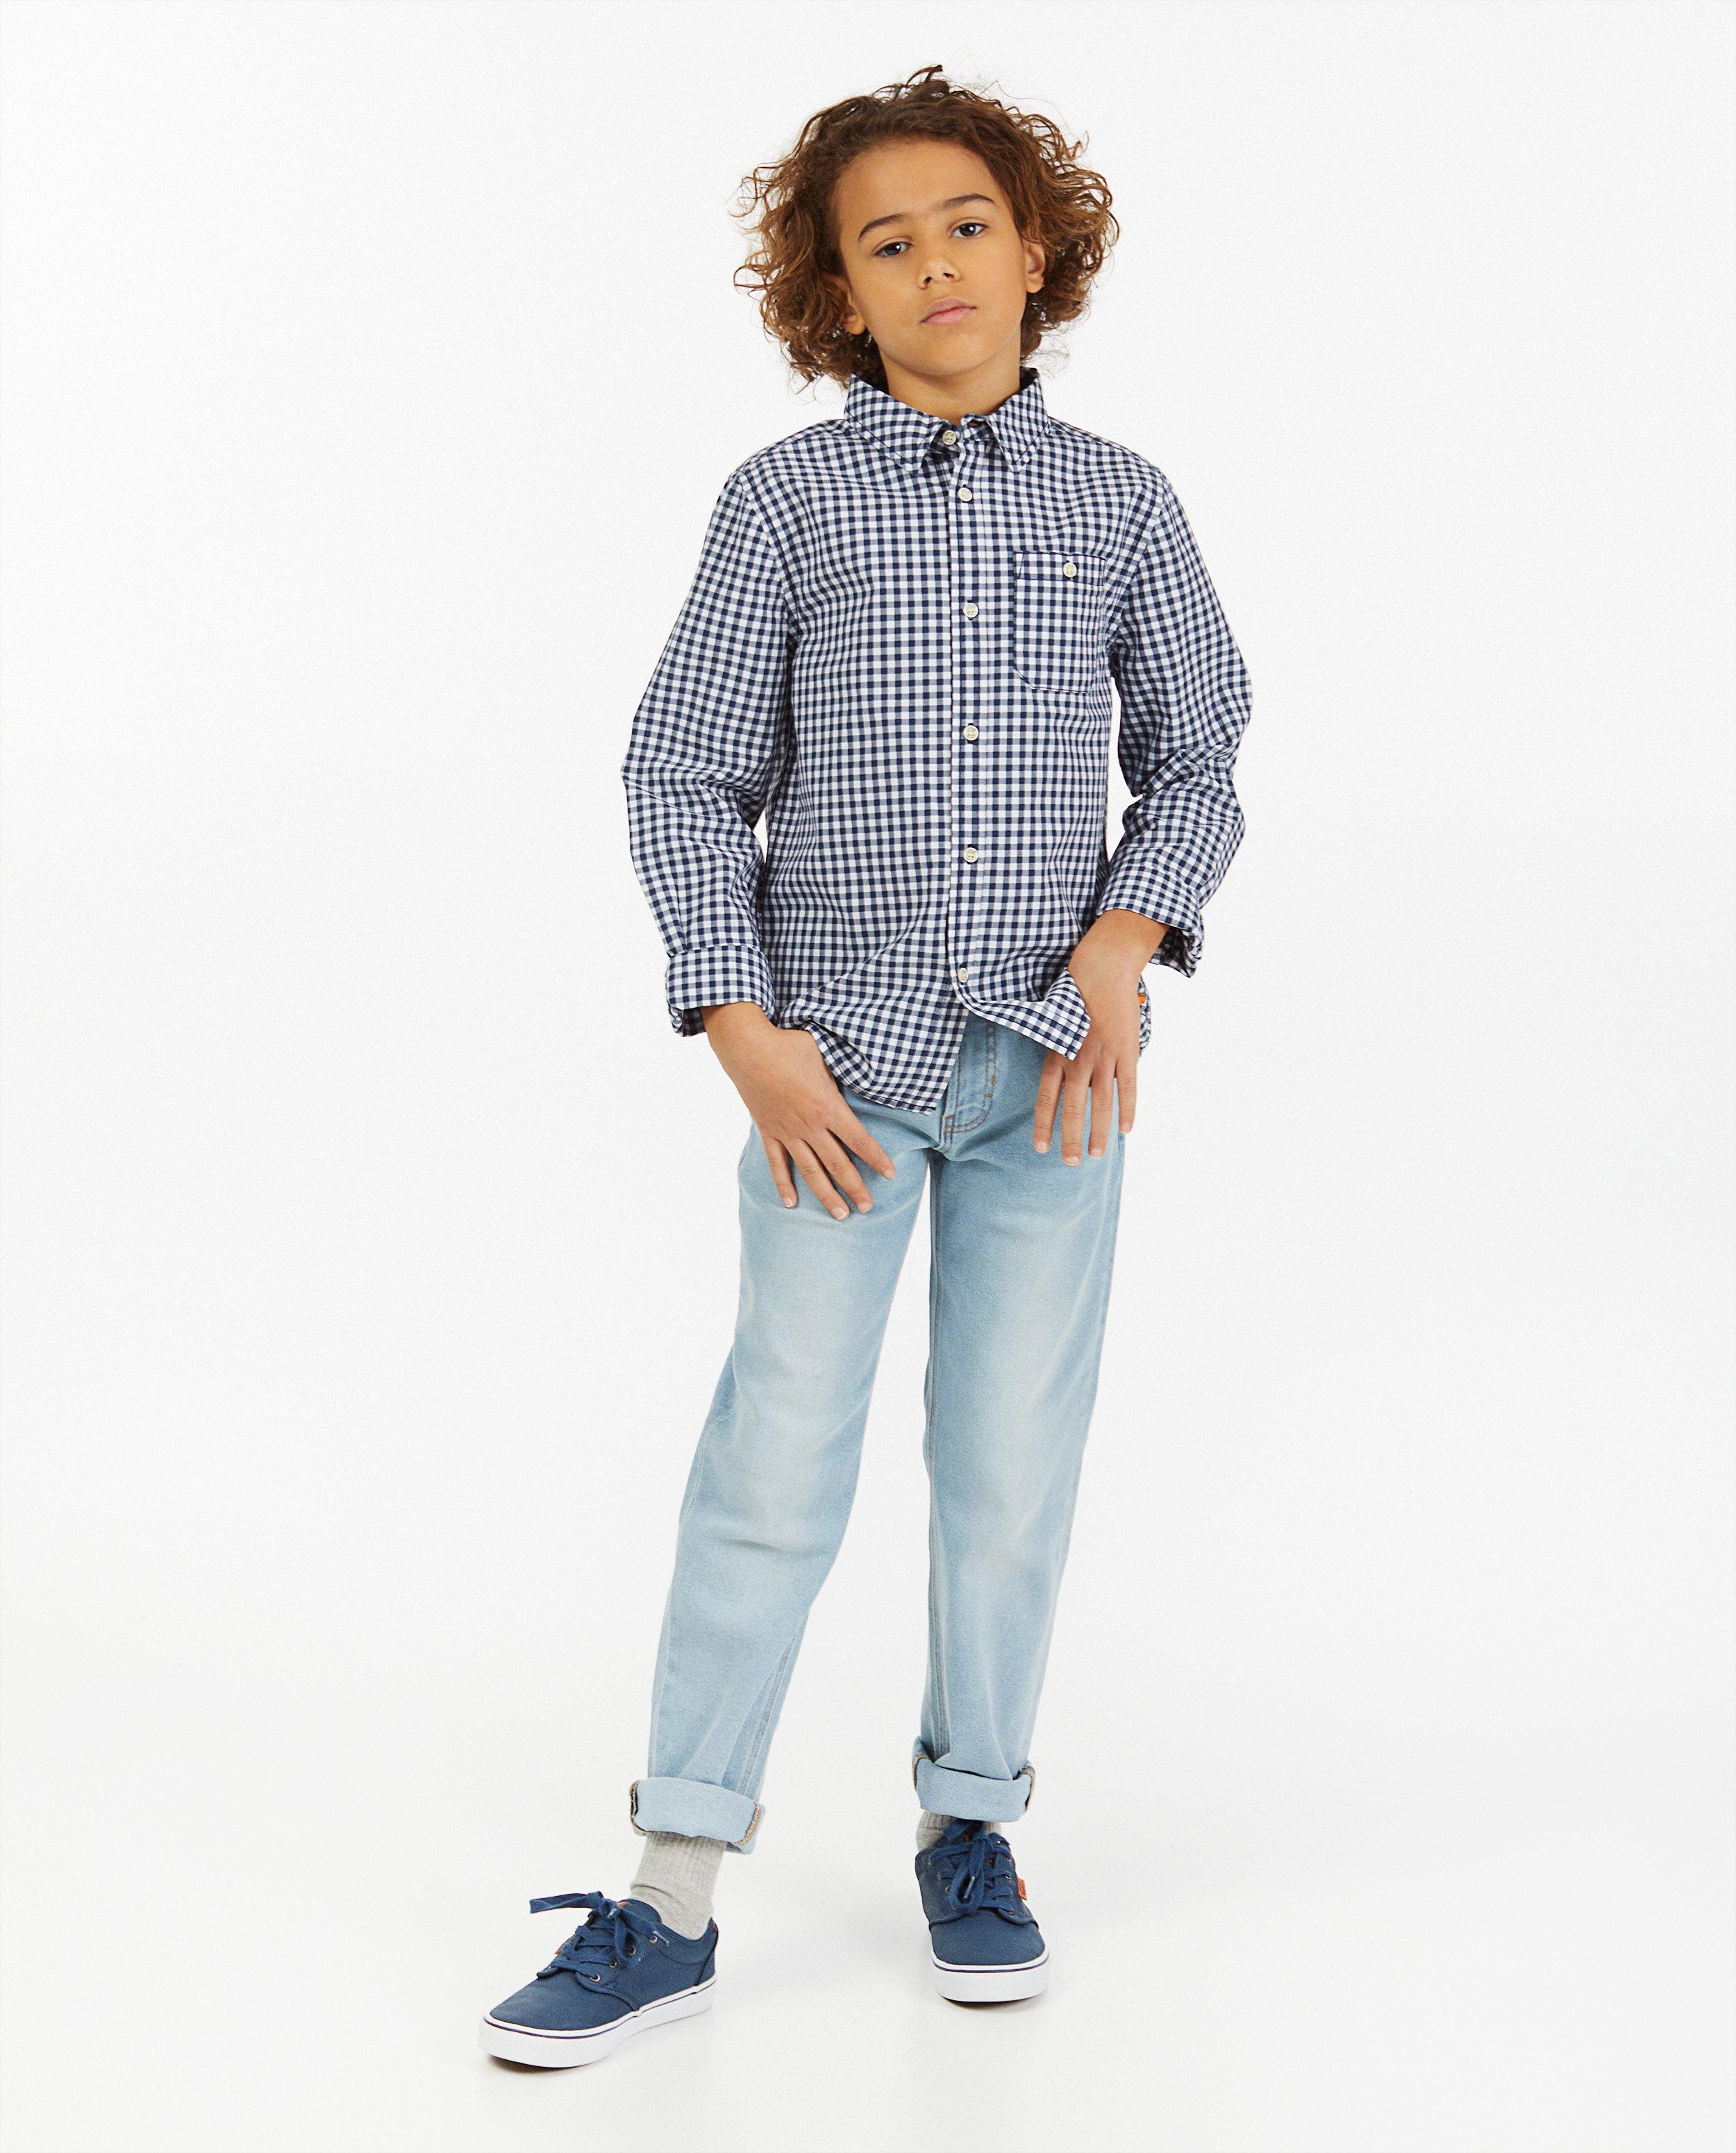 Chemise bleue à carreaux #LikeMe - intégral - Like Me